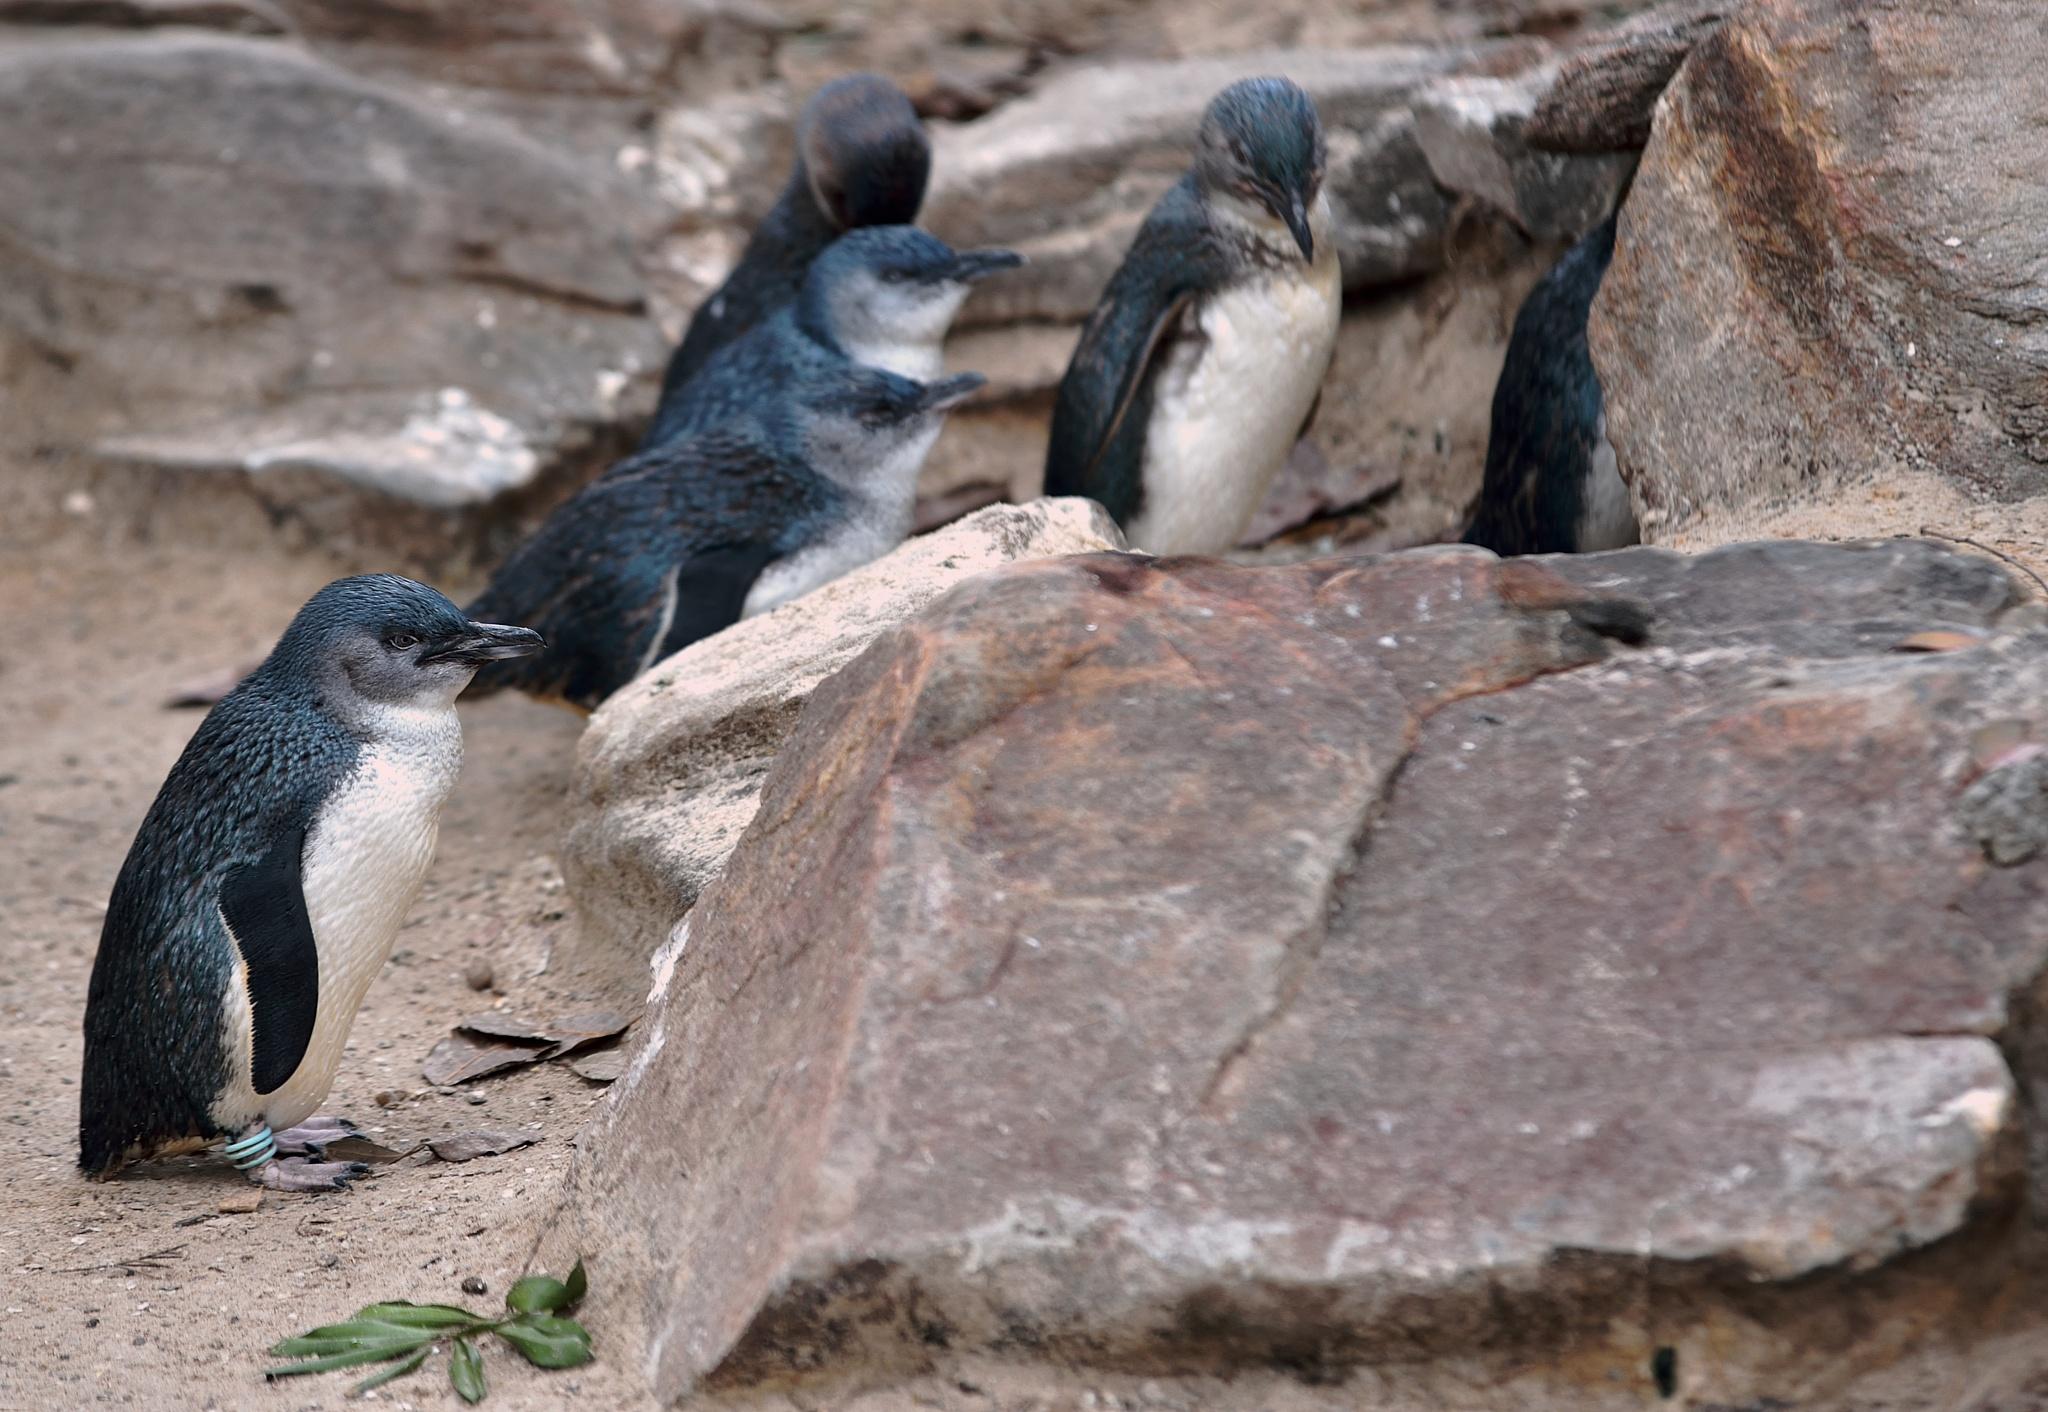 Penguins by Devis Alberti